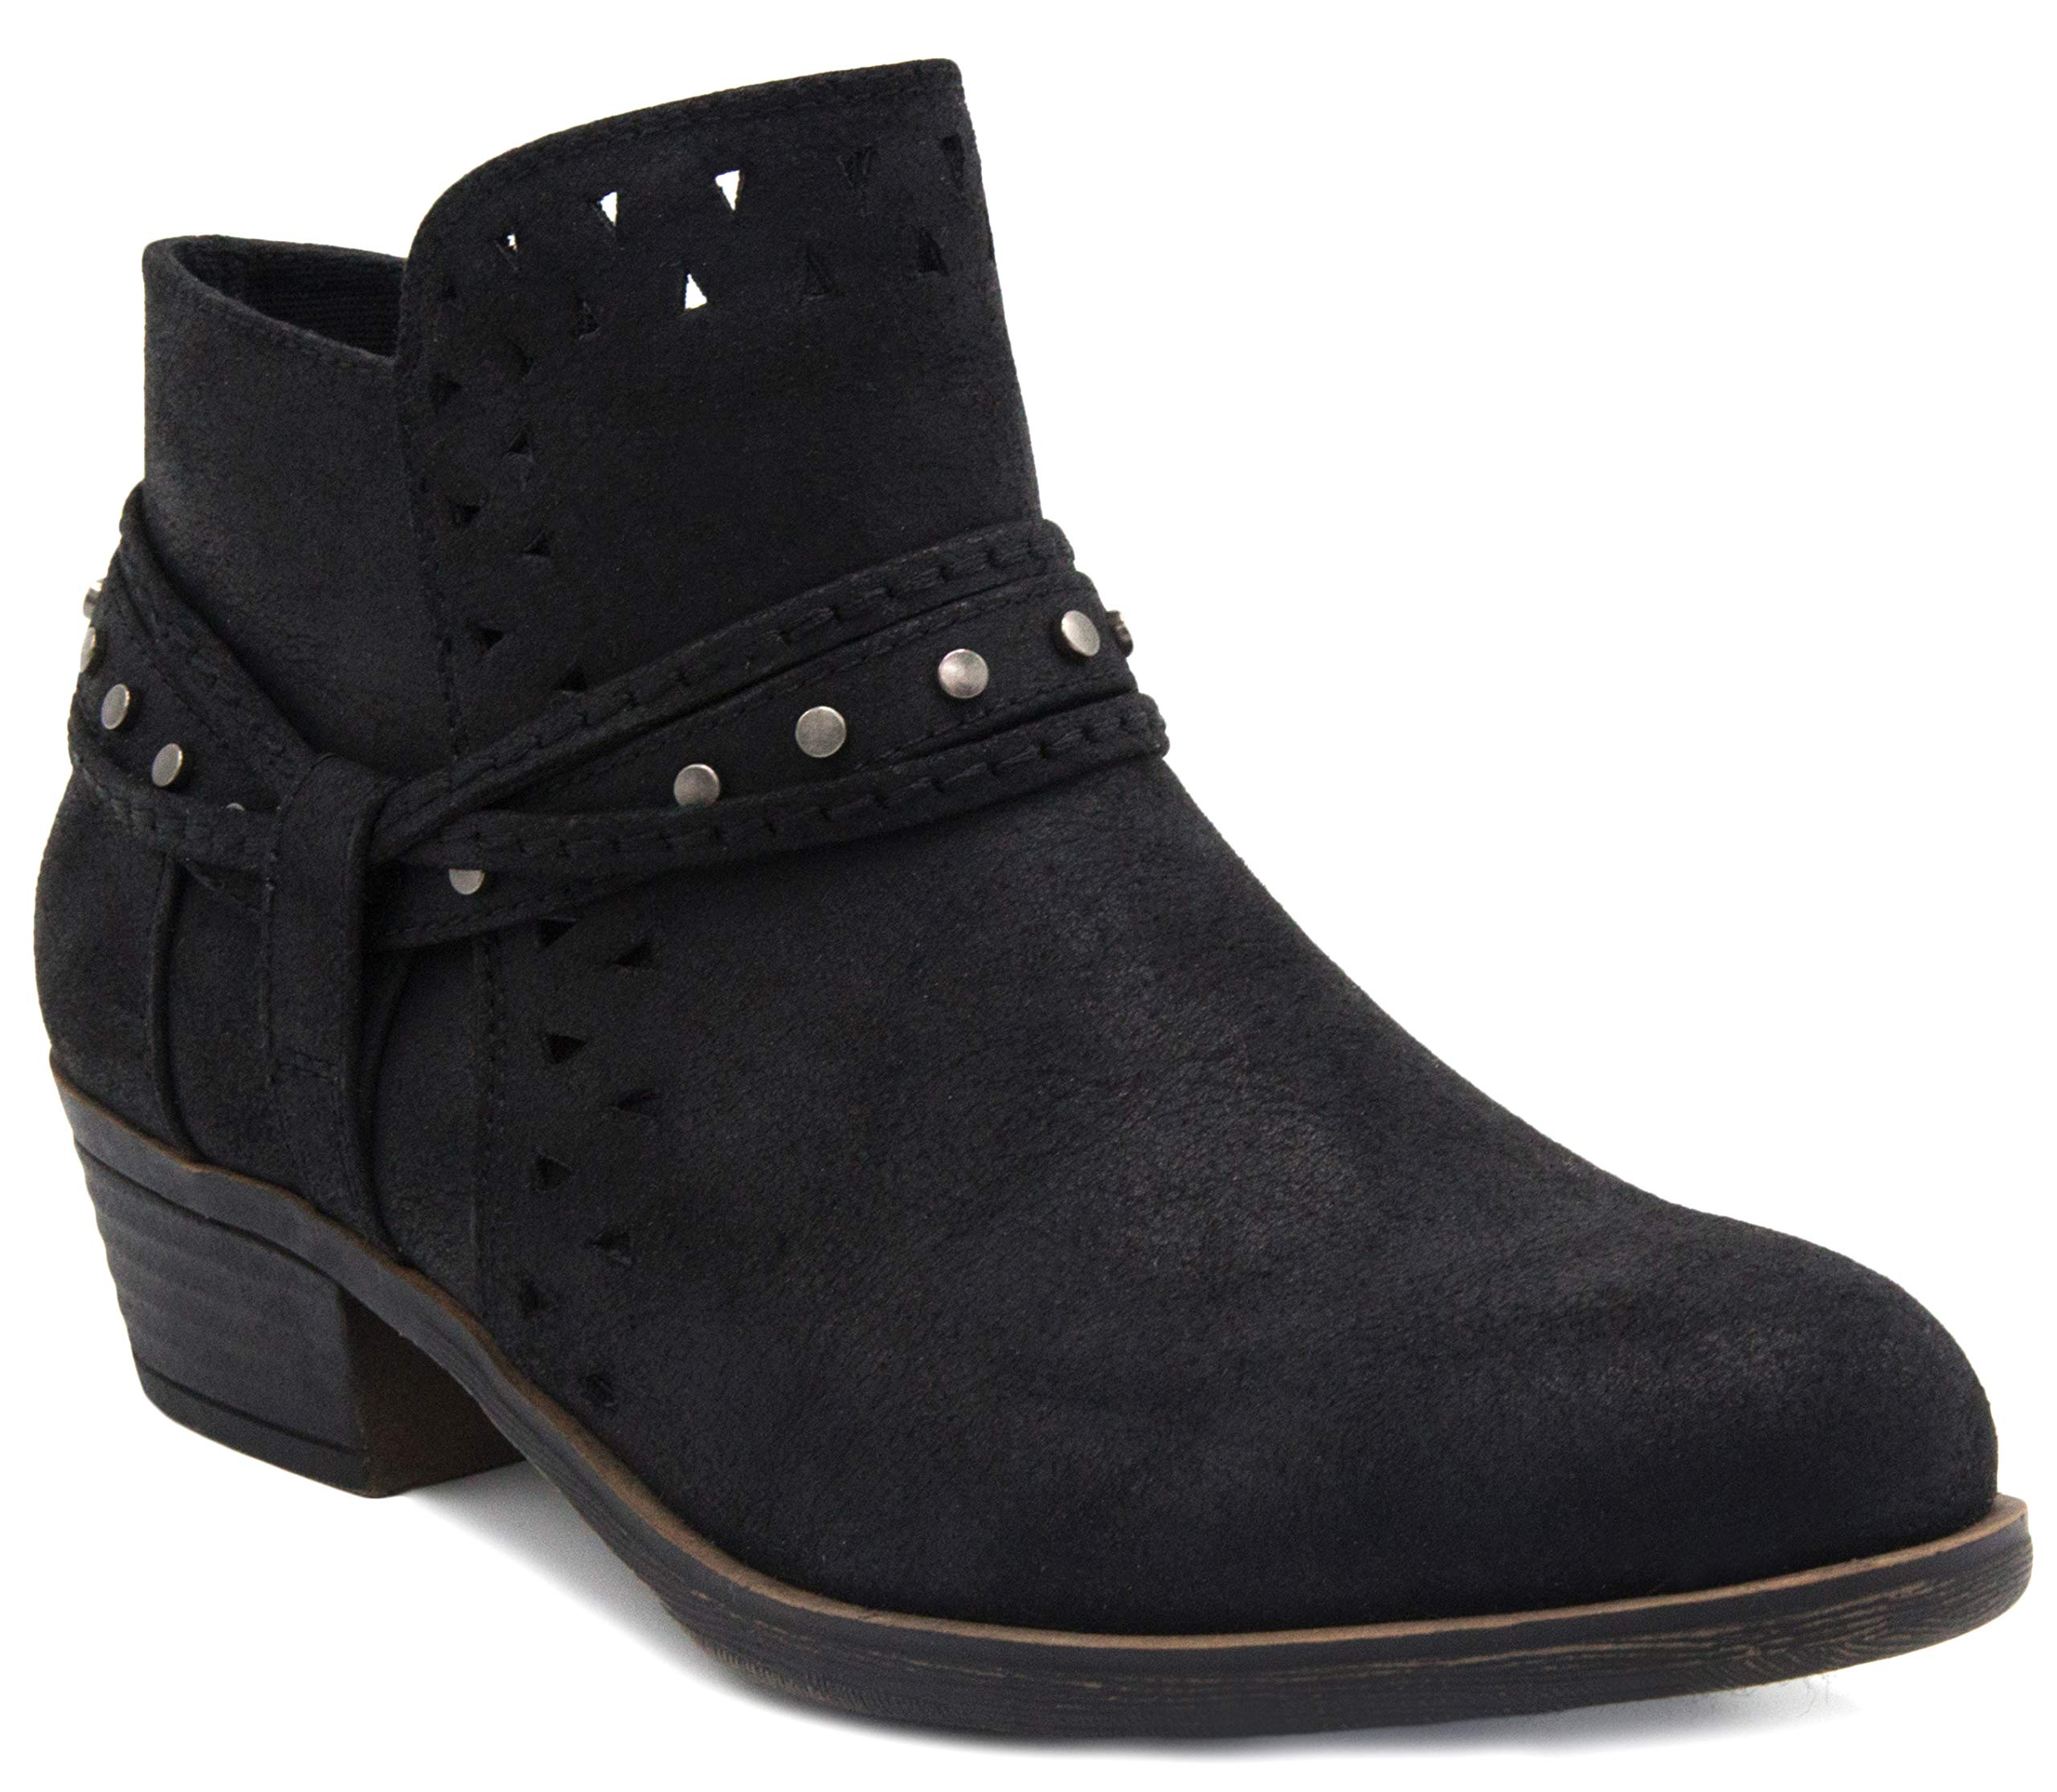 Sugar Women's Thinker Ankle Boot, Black Distress Fabric, 11 M US